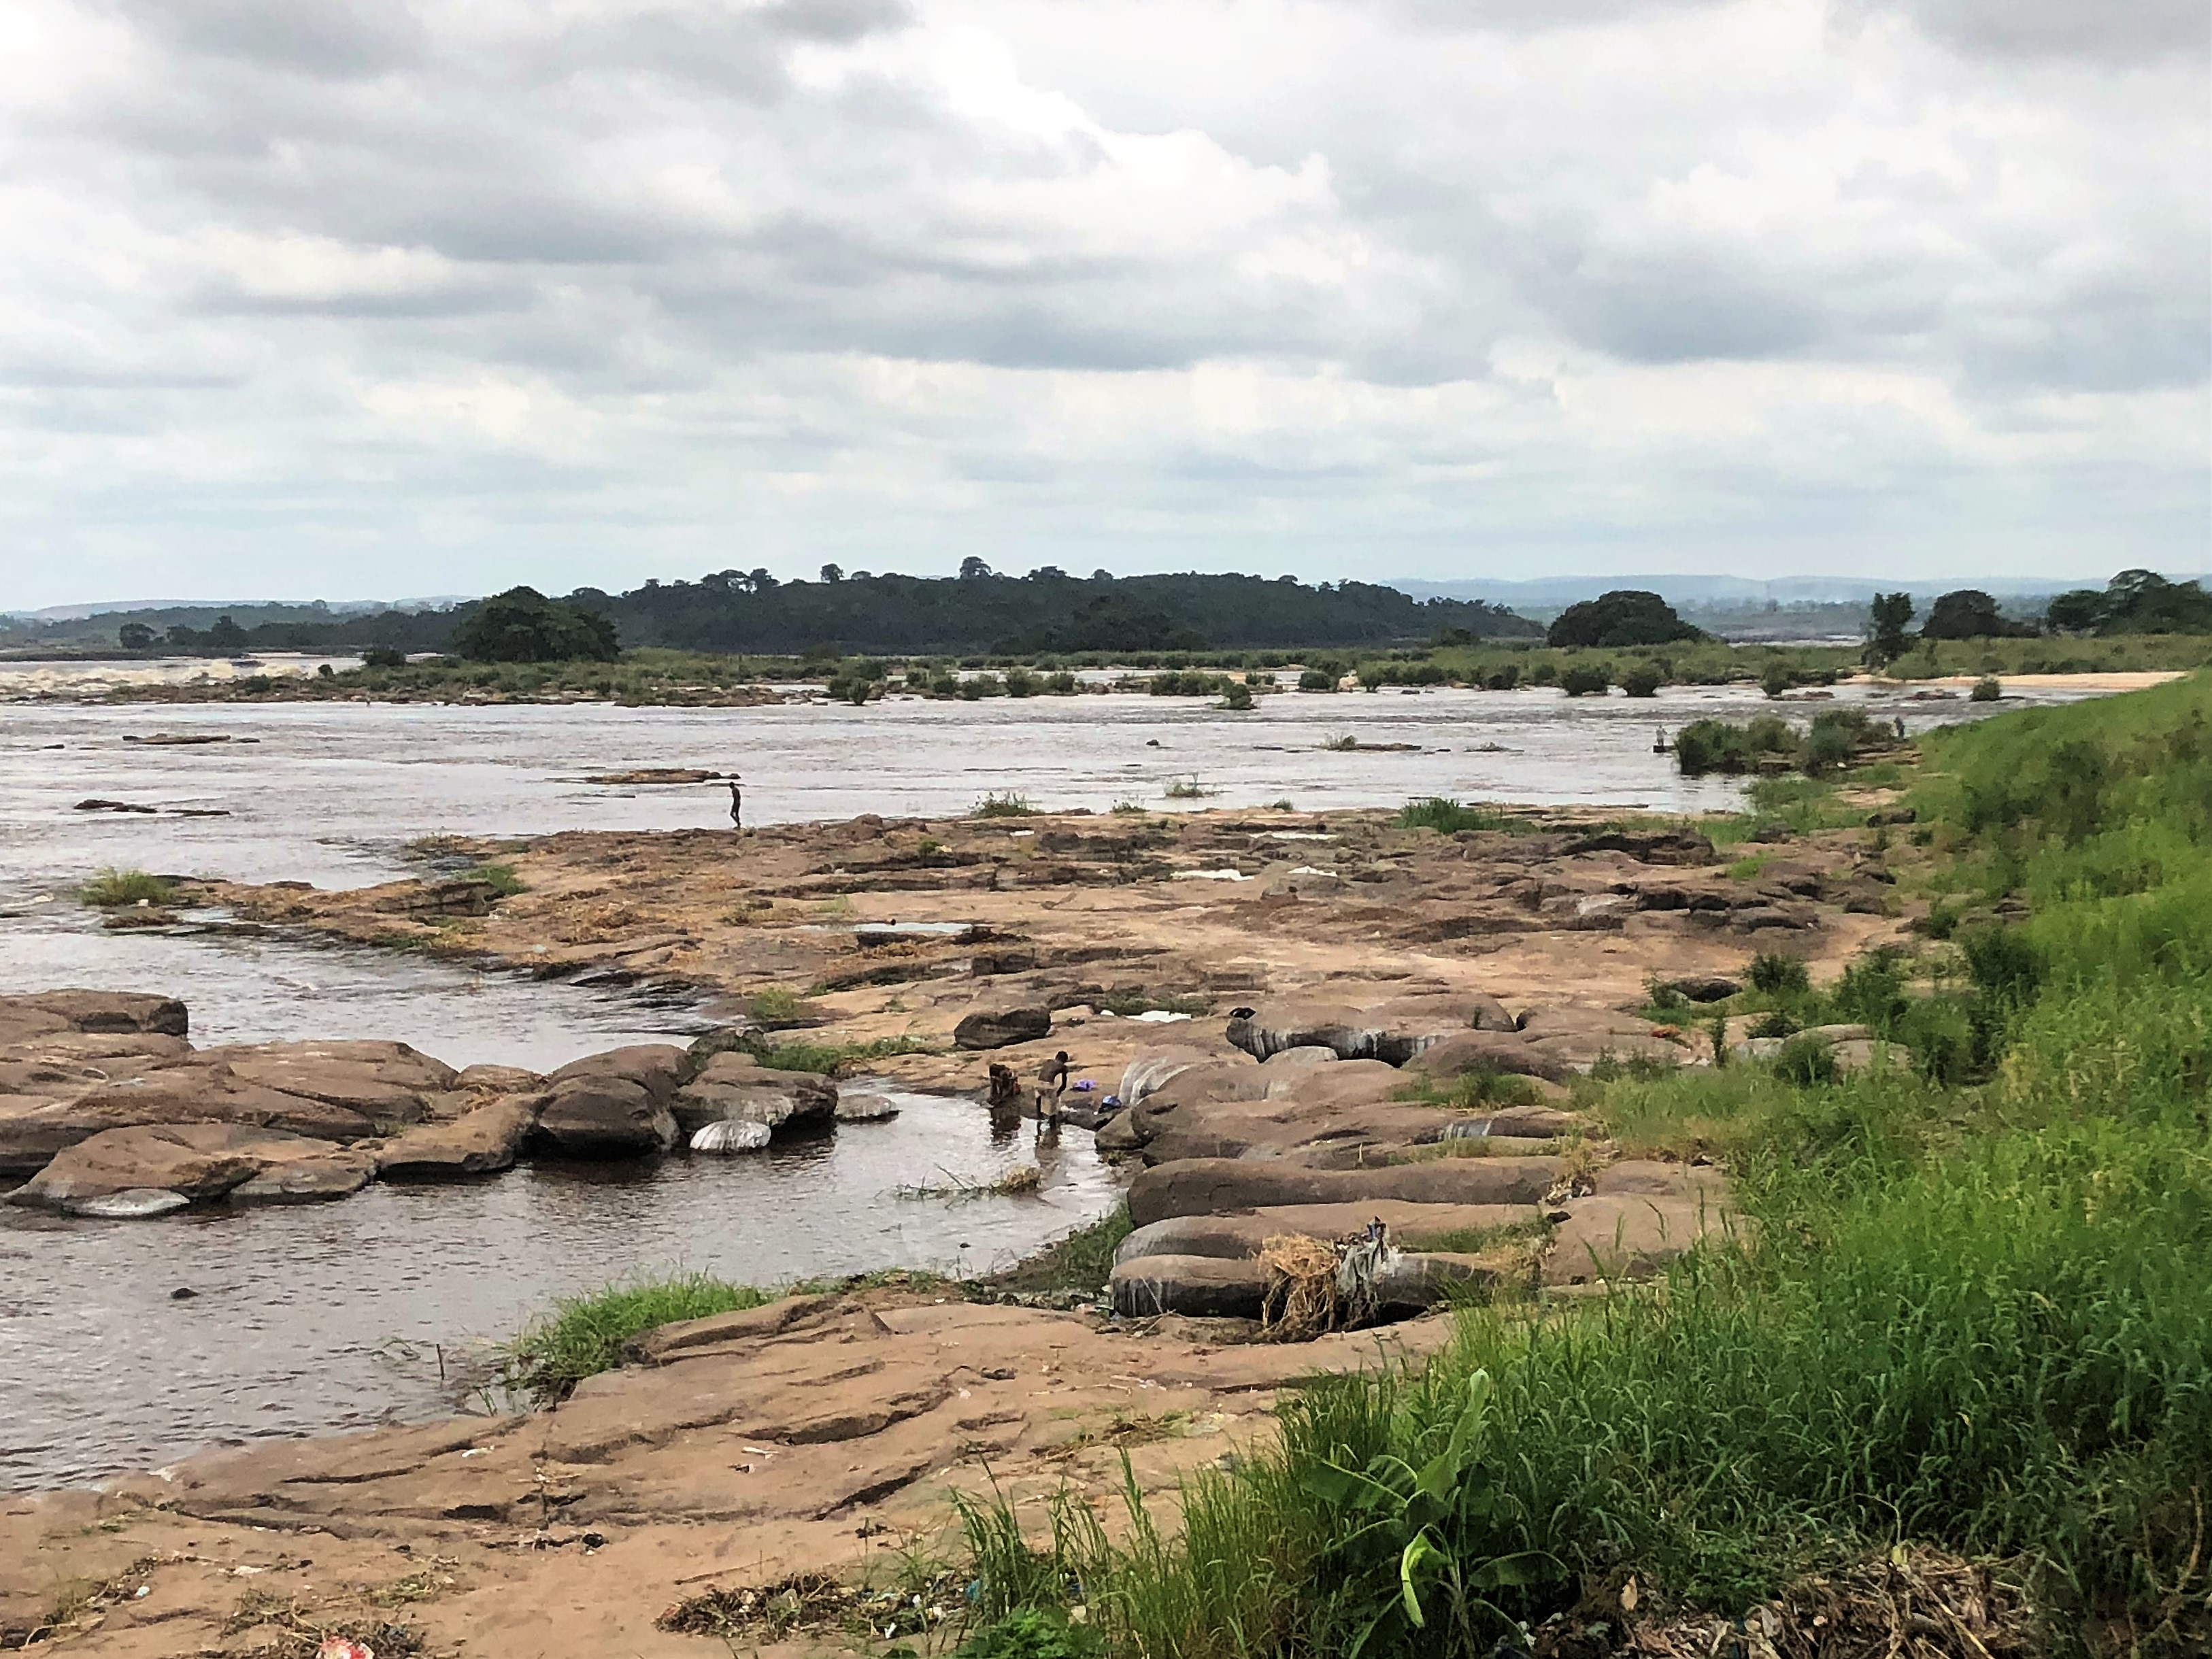 Congo riverbank